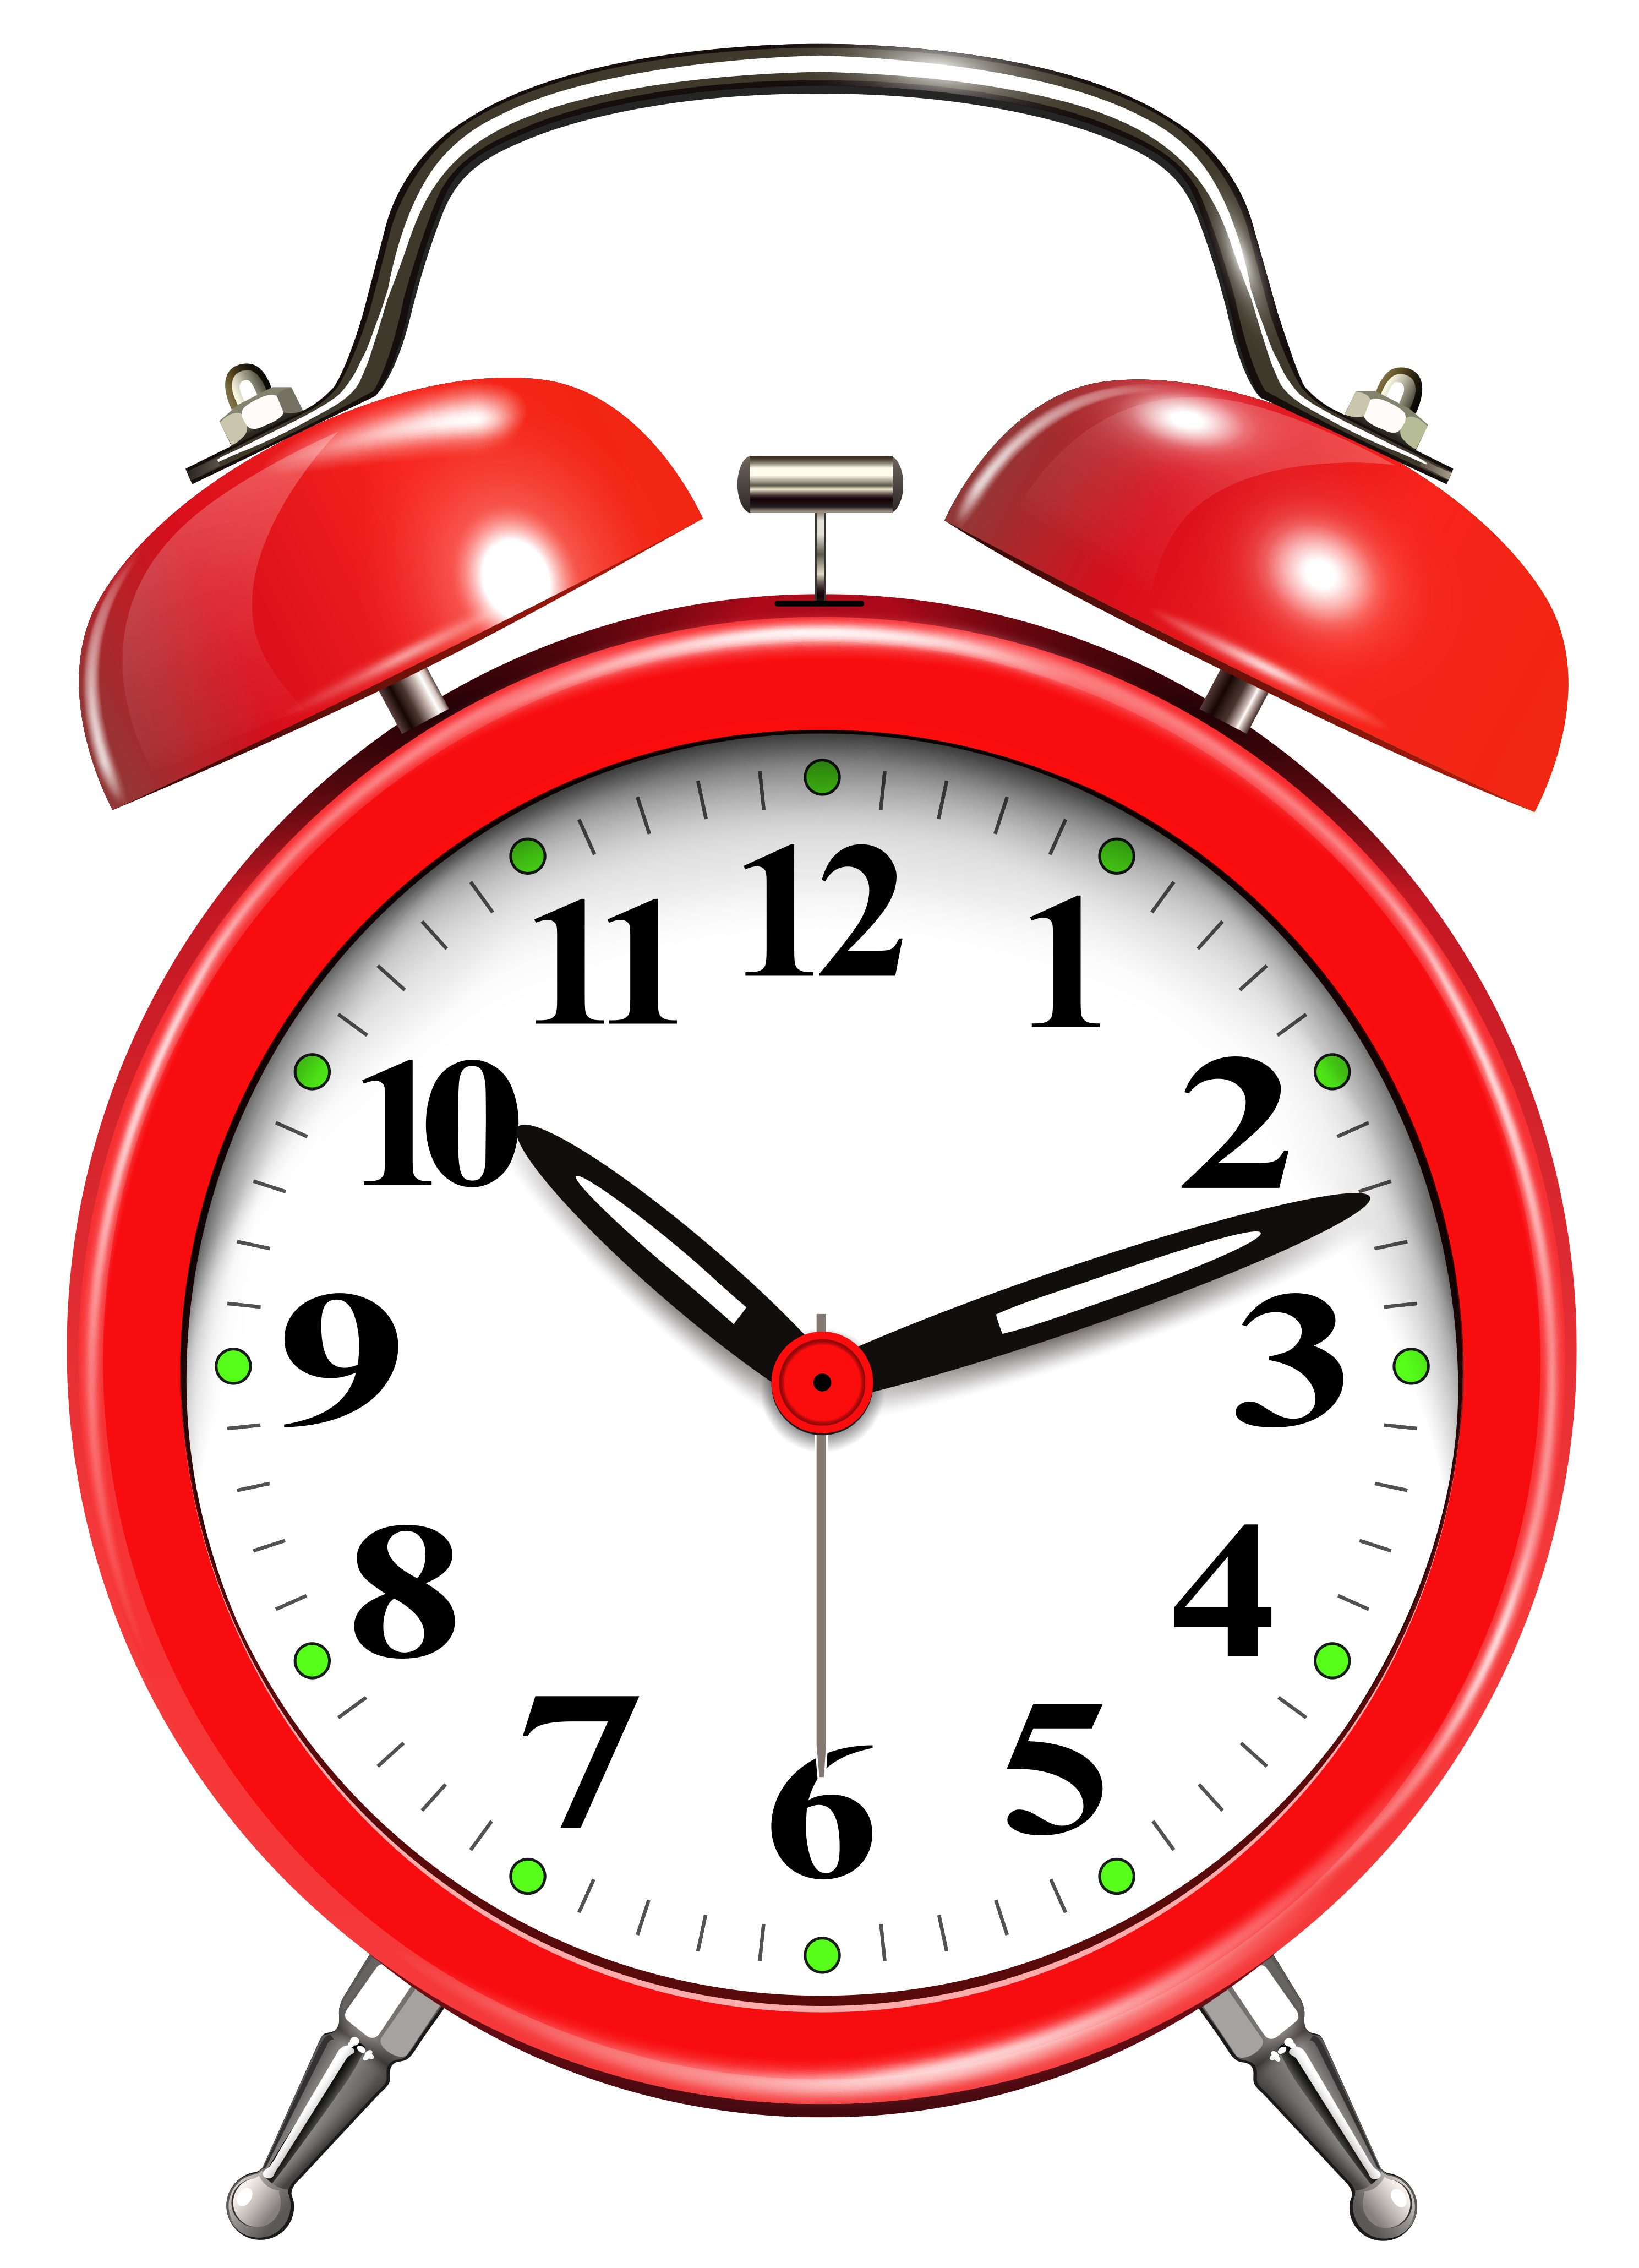 Image Of Clock Clipart 1 Alarm .-Image of clock clipart 1 alarm .-16